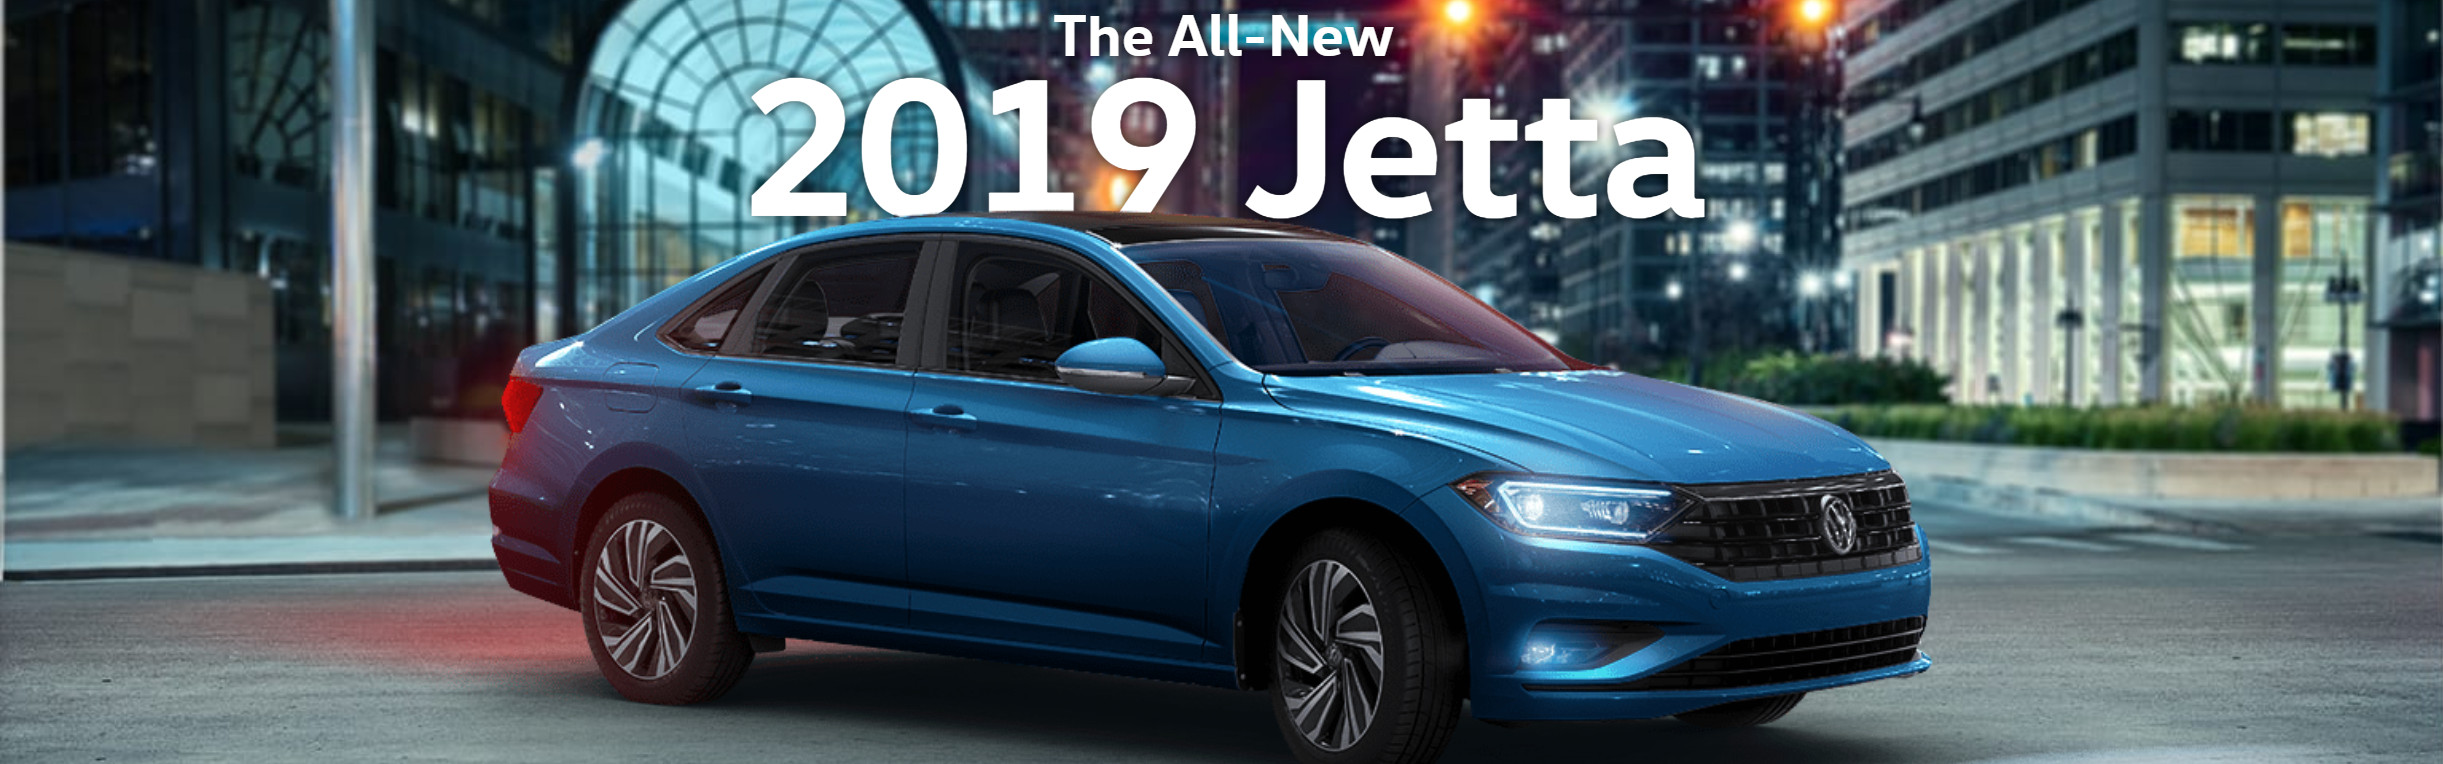 2019 Volkswagen Jetta at Mississauga Volkswagen in Mississauga, the Greater Toronto Area GTA, Ontario, Canada